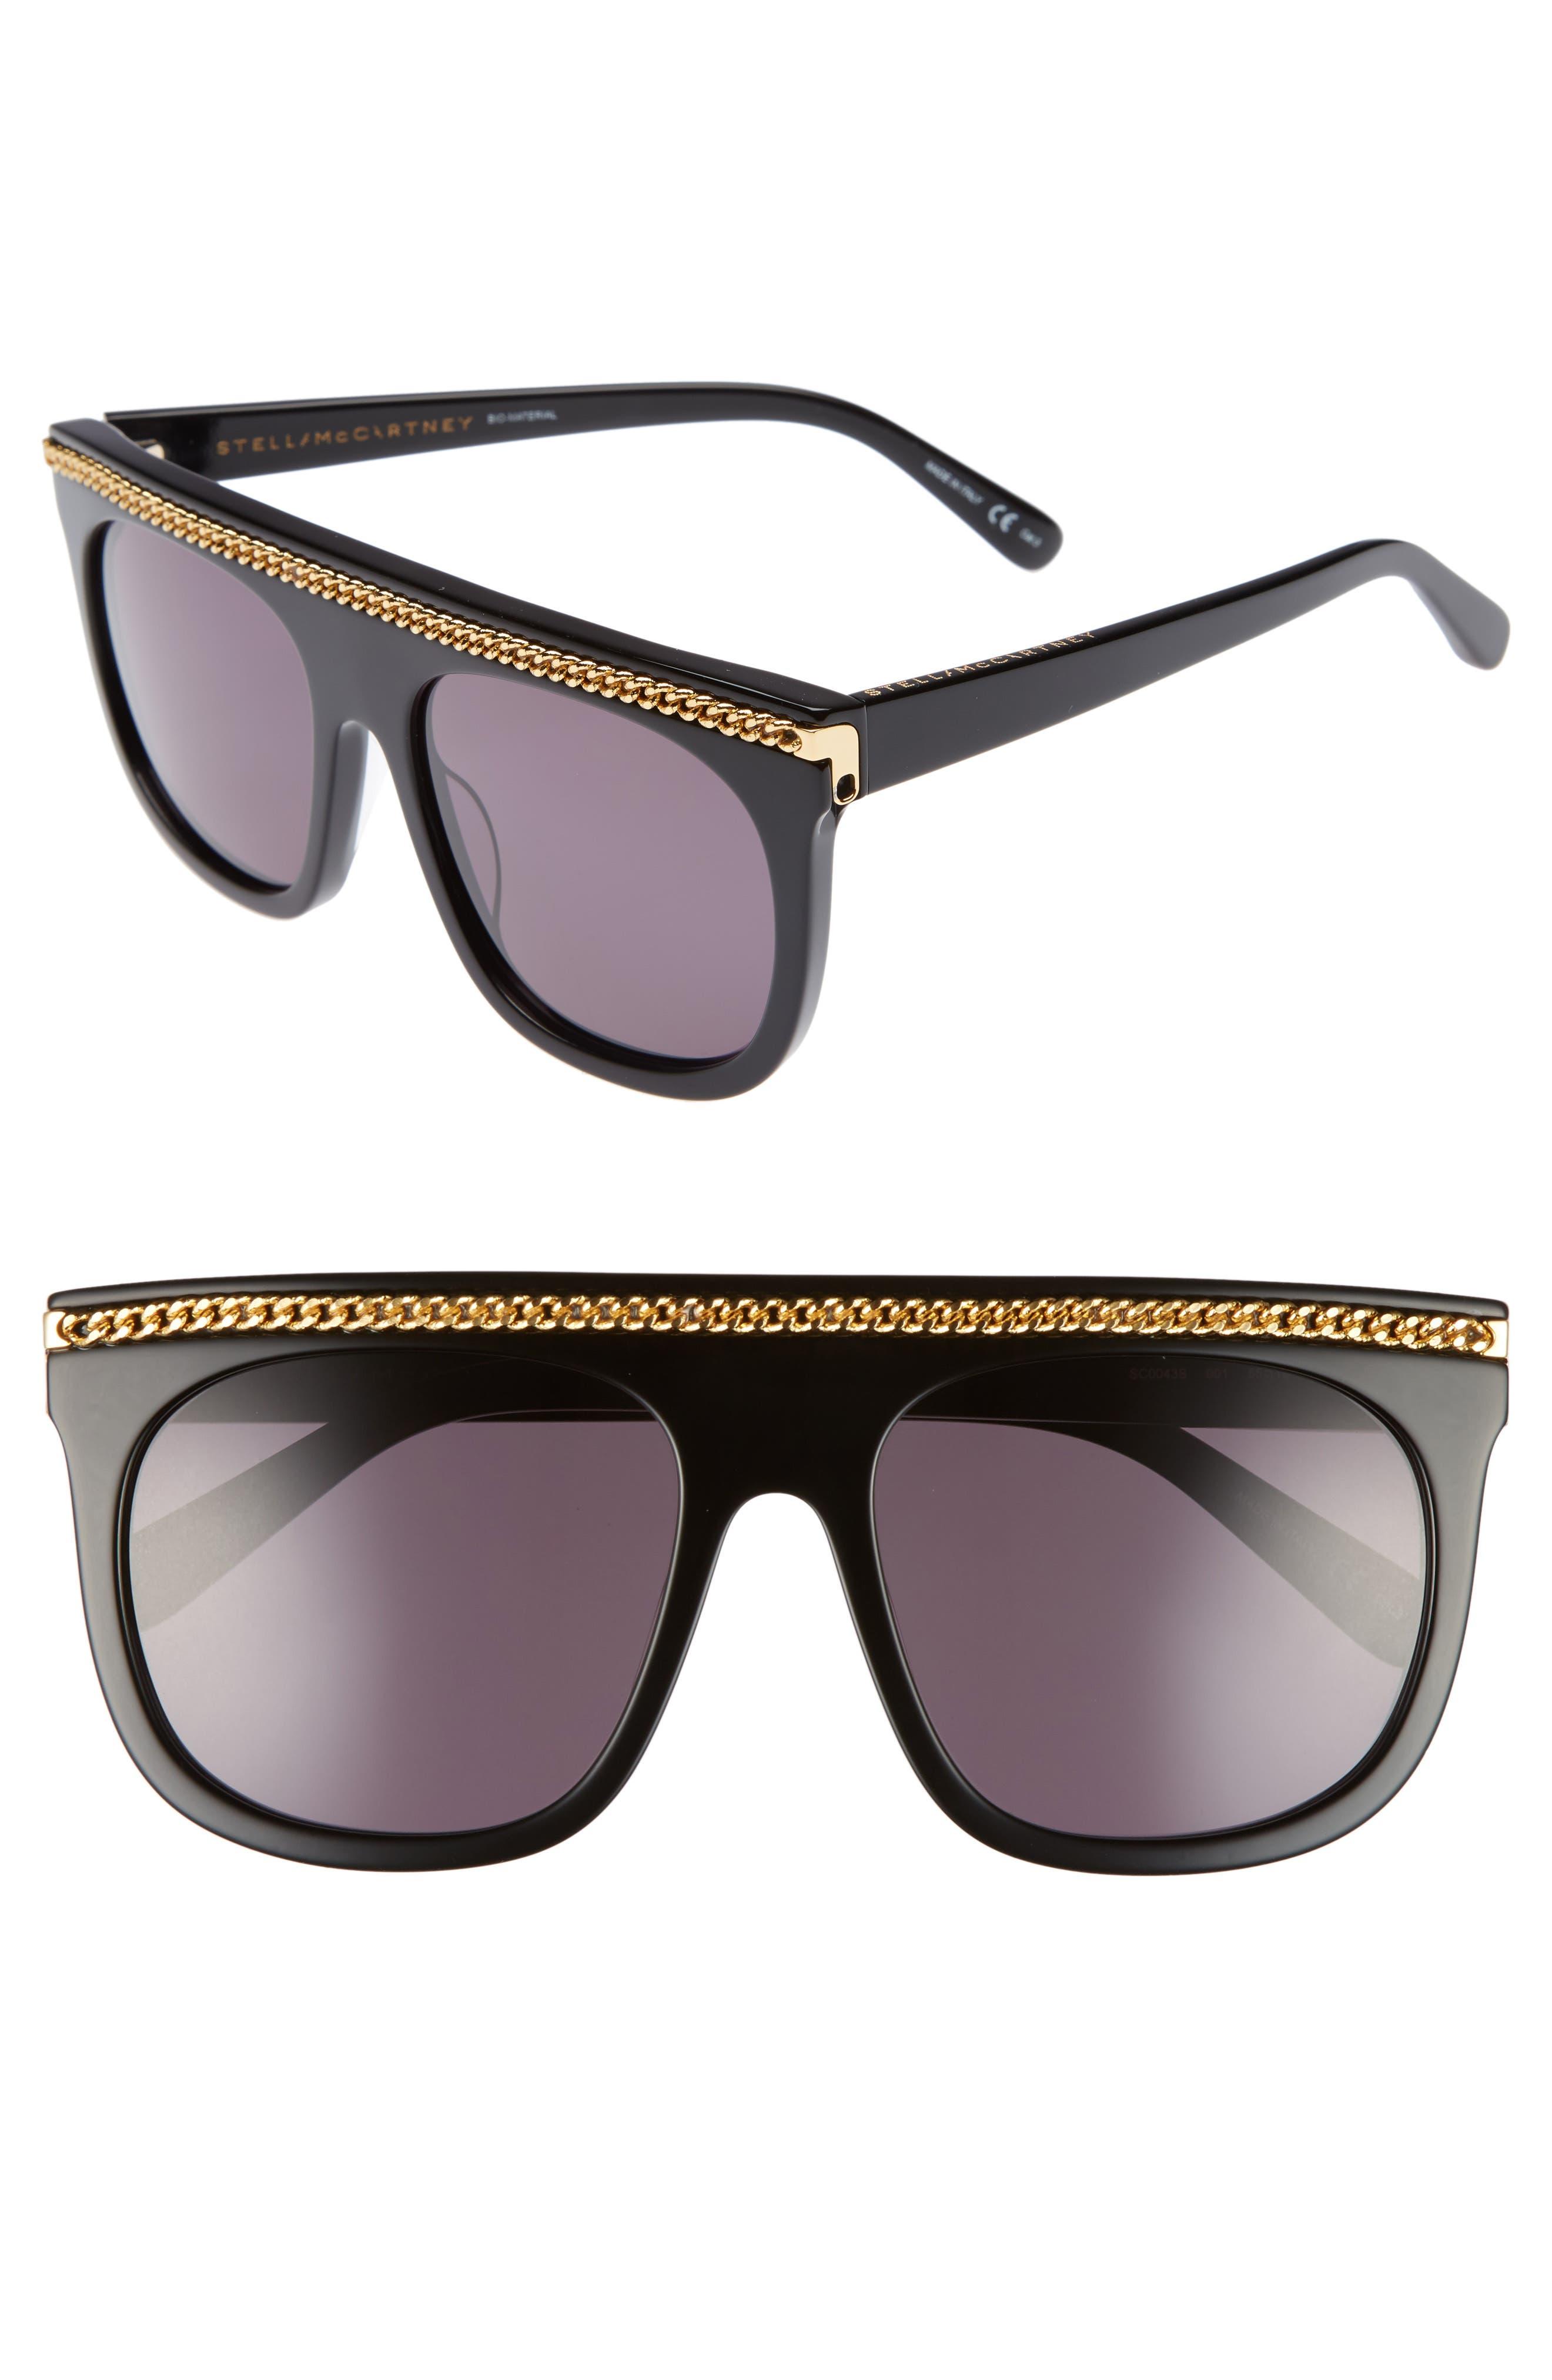 55mm Flat Top Sunglasses,                             Main thumbnail 1, color,                             001